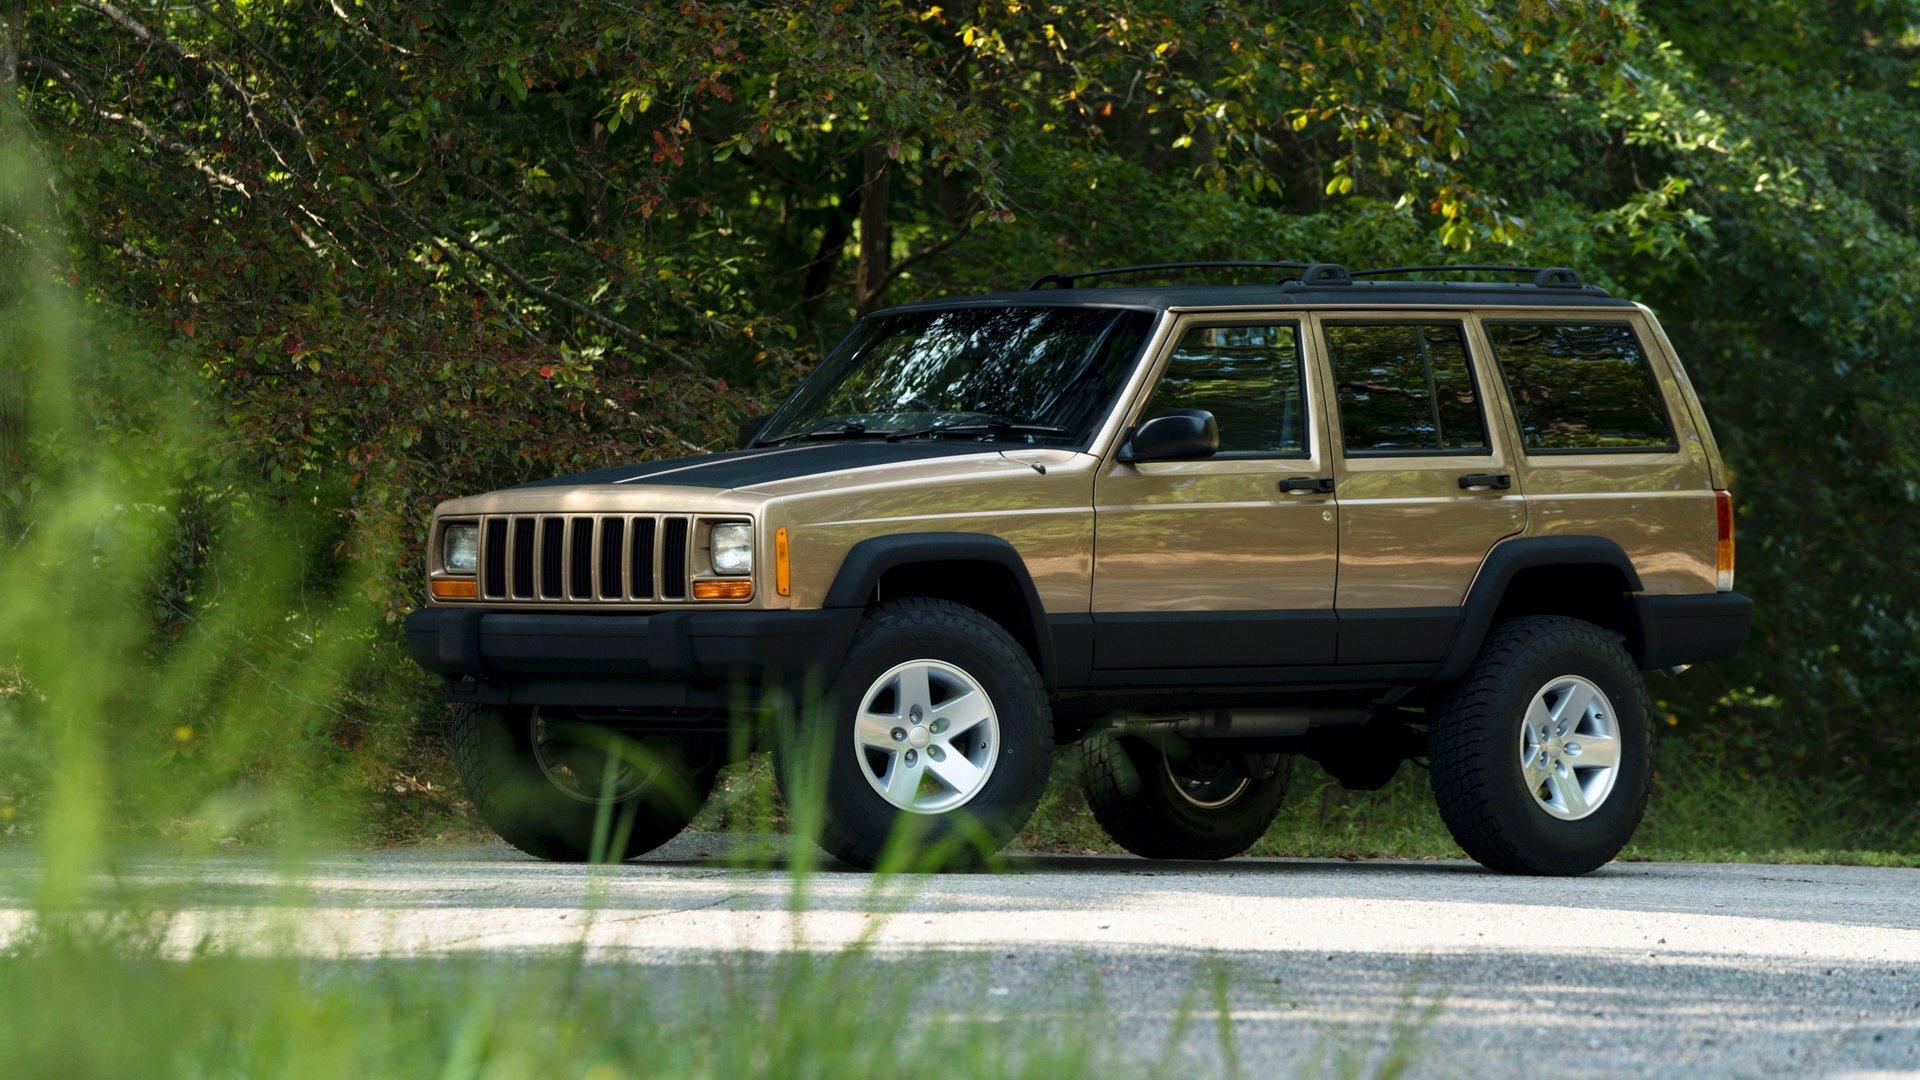 2000 jeep cherokee das stage 2 cherokee xj